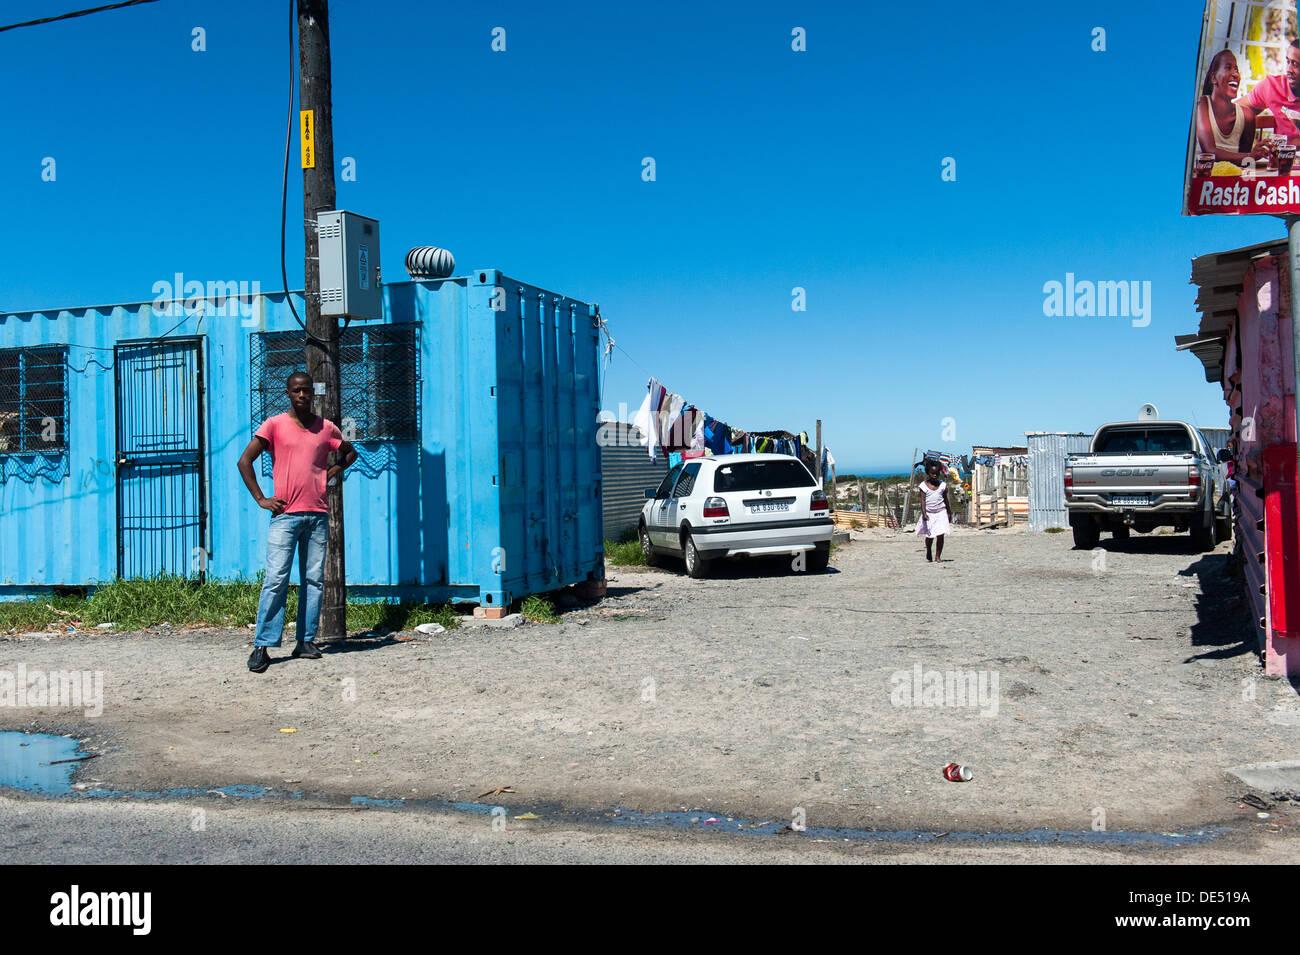 Khayelitsha, Cape Town, Western Cape, South Africa - Stock Image